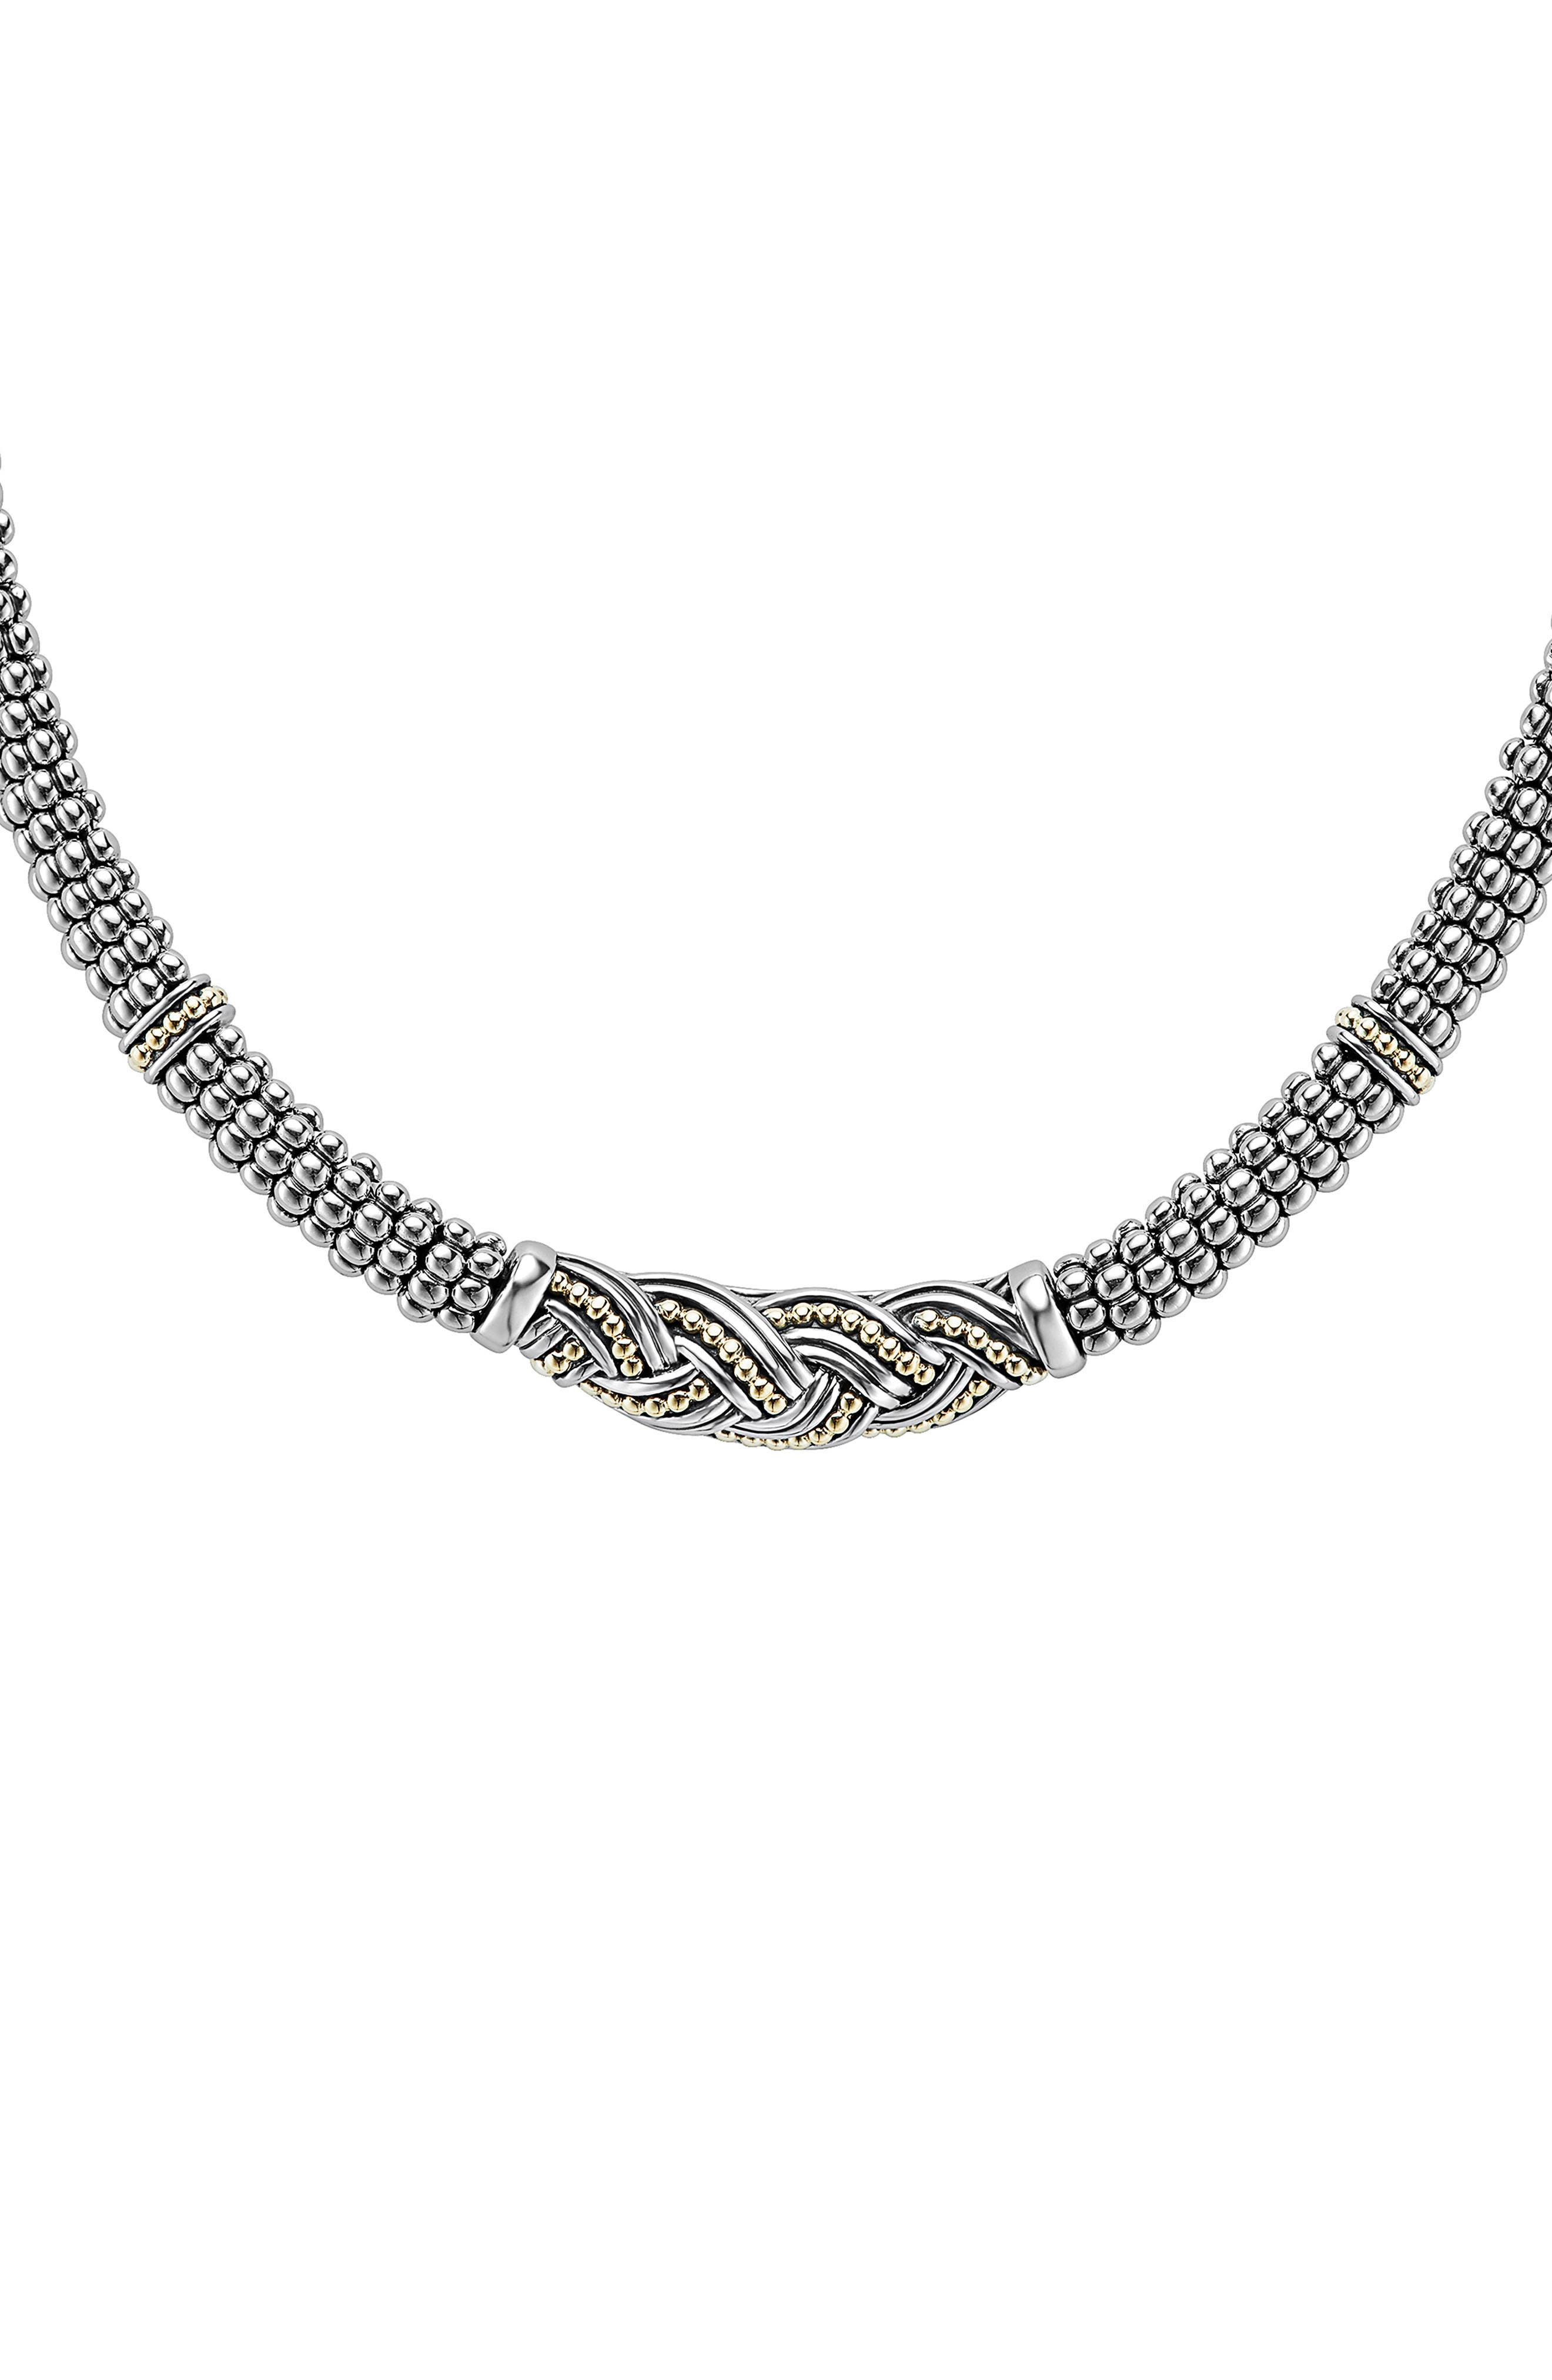 Torsade Rope Necklace,                             Main thumbnail 1, color,                             Silver/ Gold